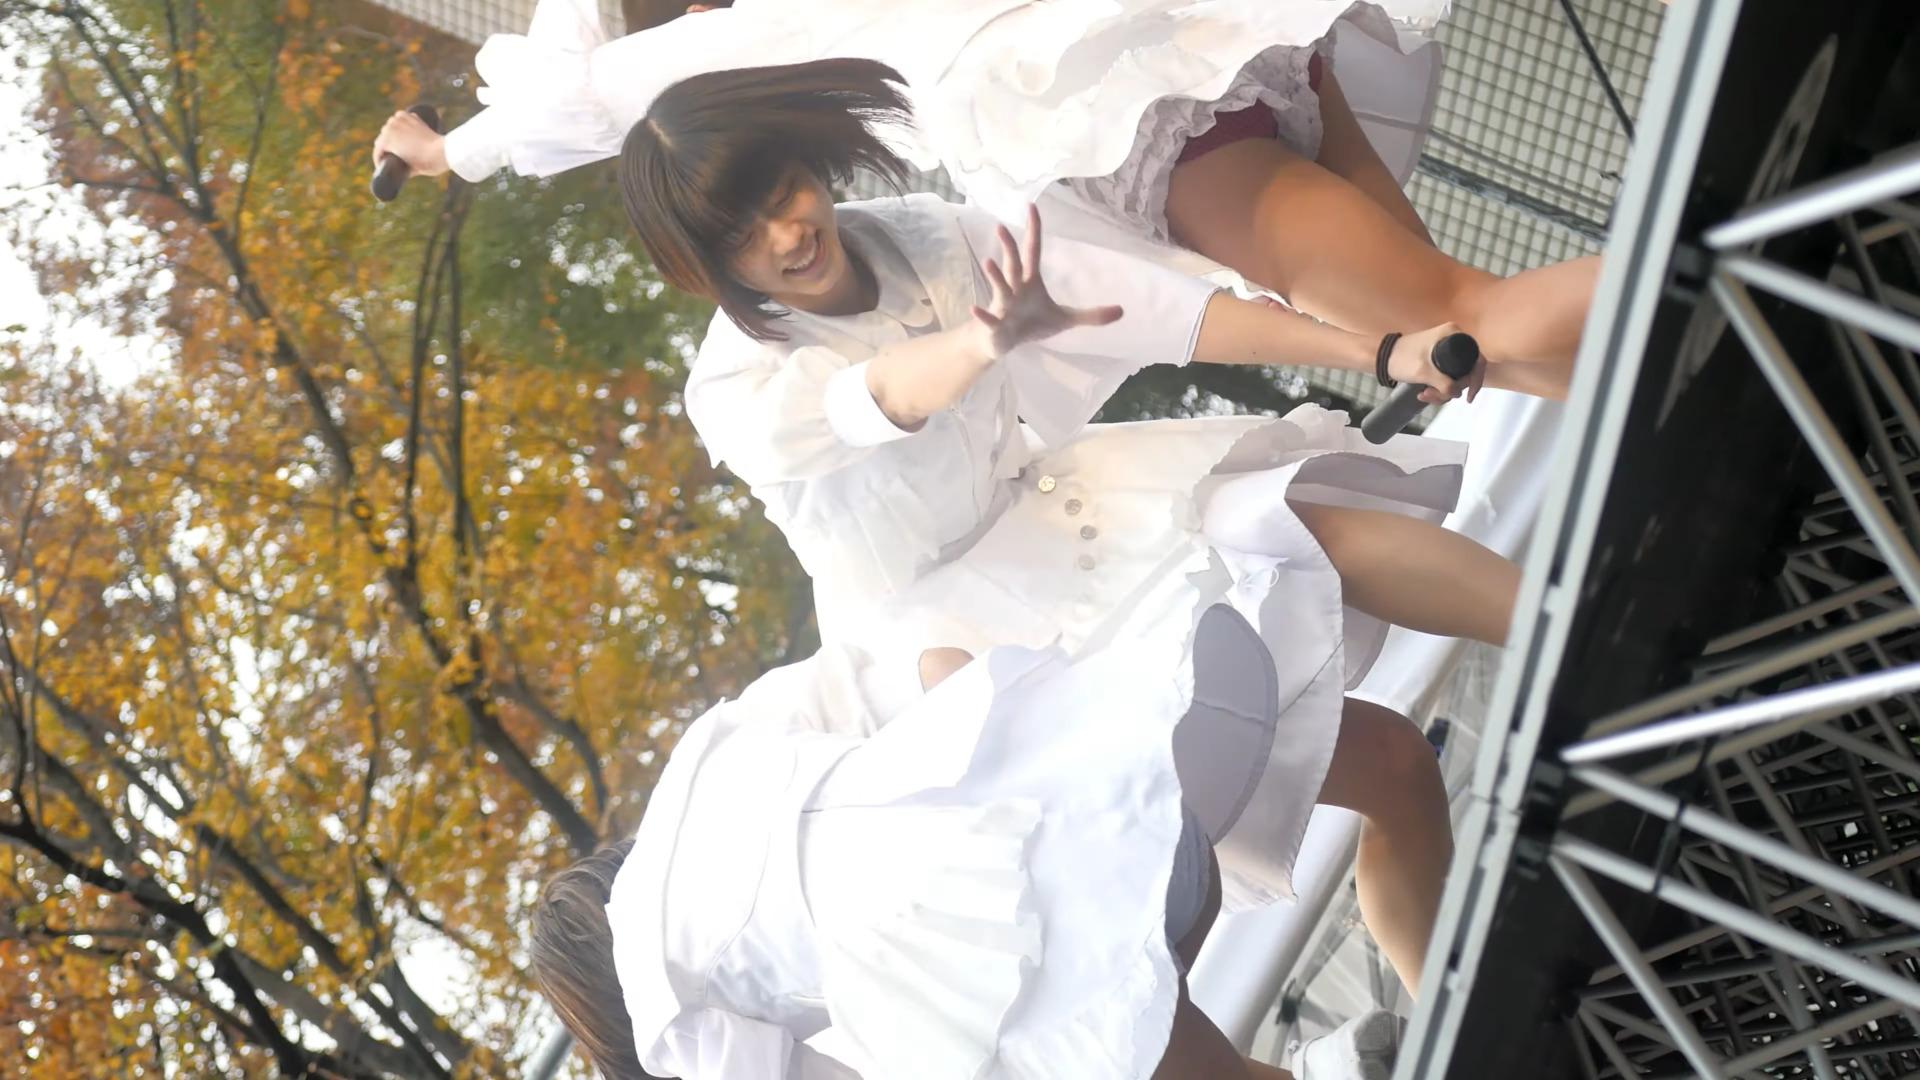 【4K】真っ白なキャンバス 「アイデンティティ」 東京大学 駒場祭 2019.11.24 03:22